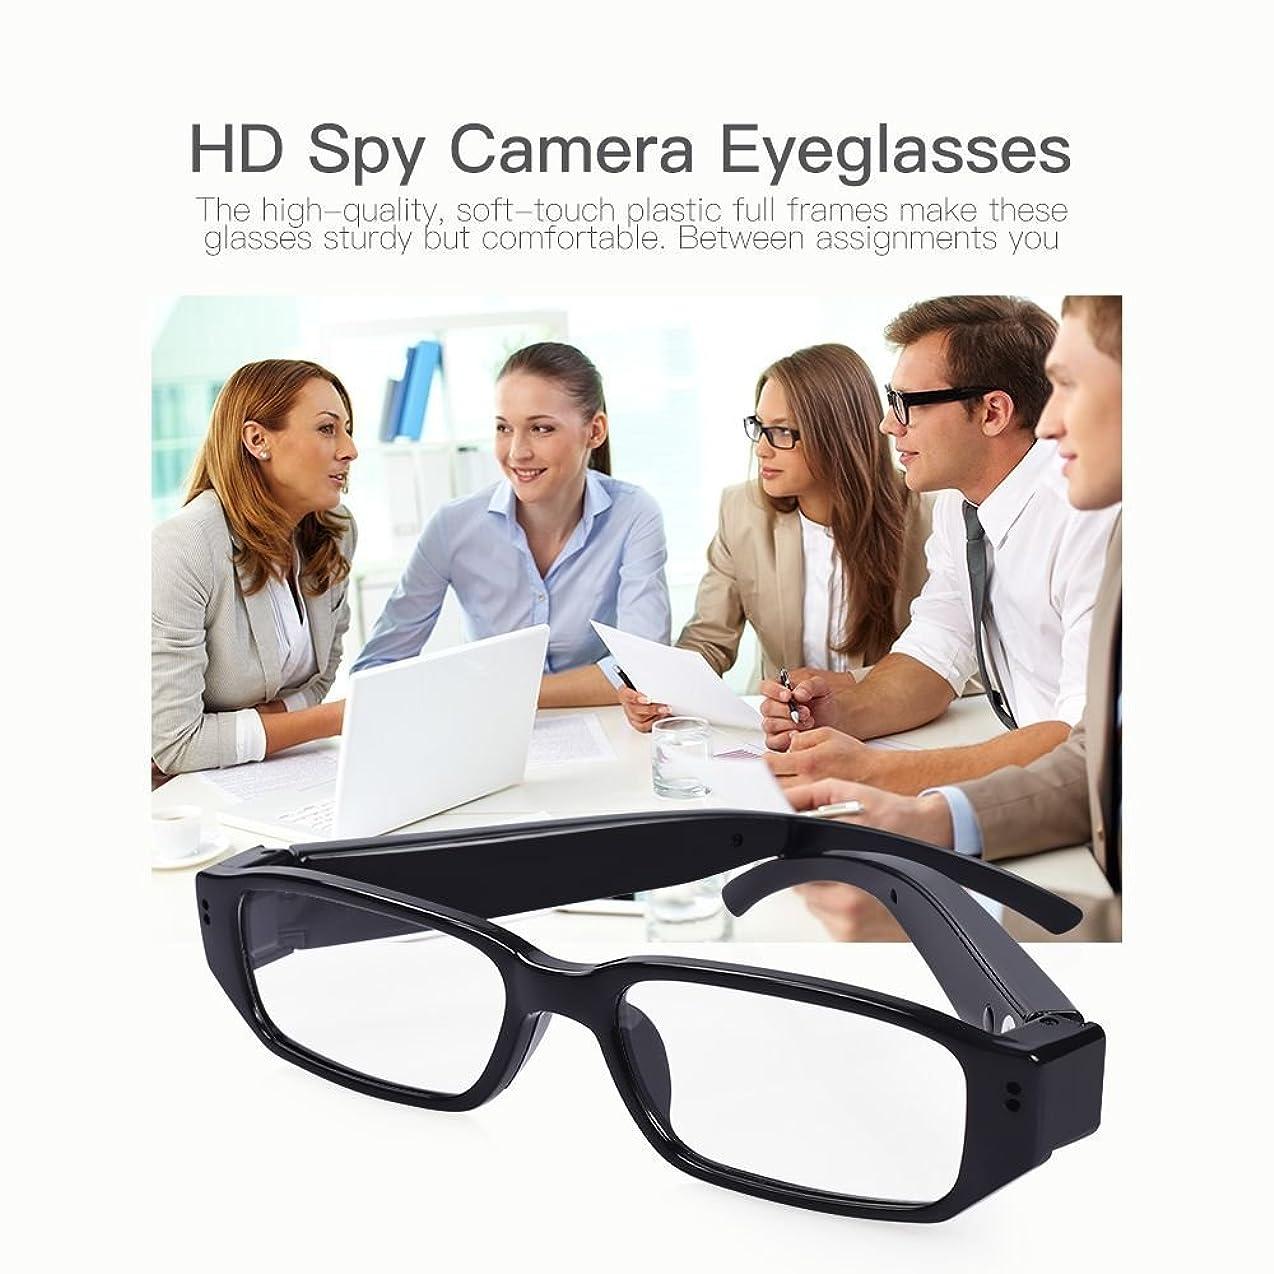 Spy Camera Glasses Hidden Full HD 1080P Mini Camera Fashion Loop Video Recorder Portable Security Cam dbtpglvizbny6048